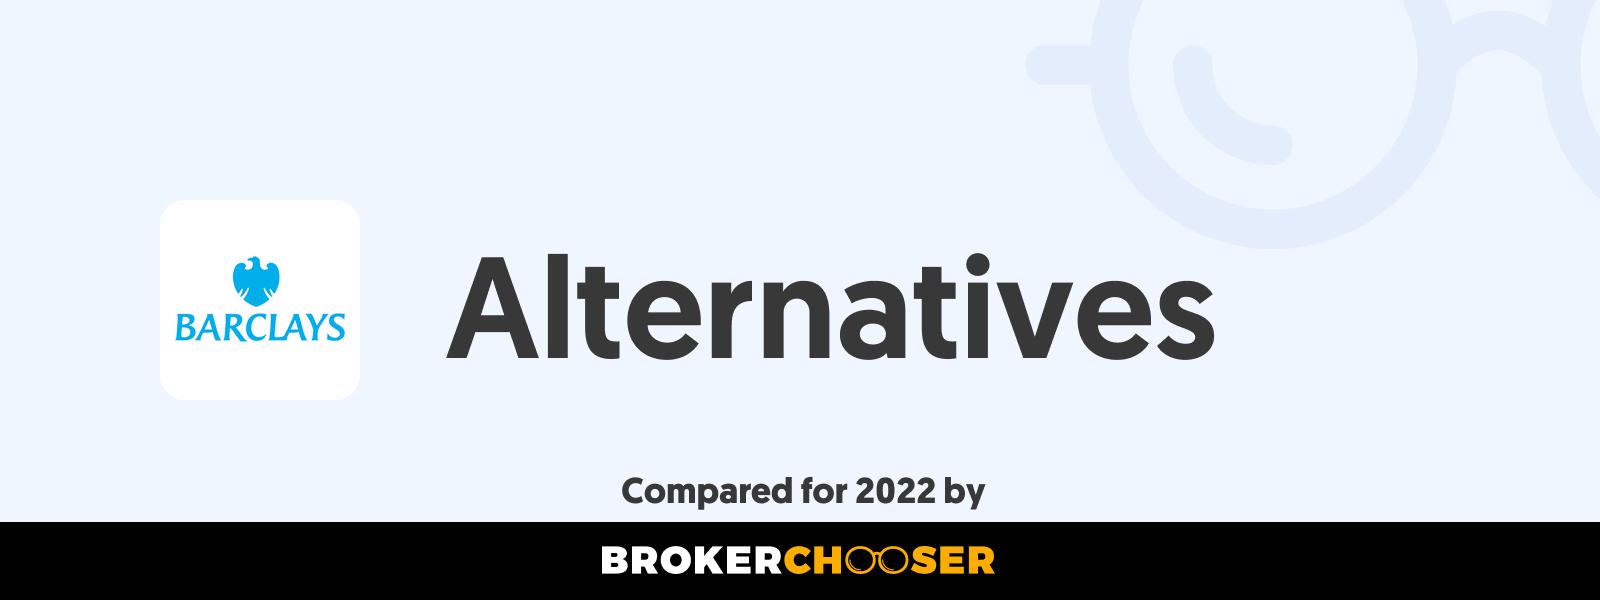 Barclays Alternatives